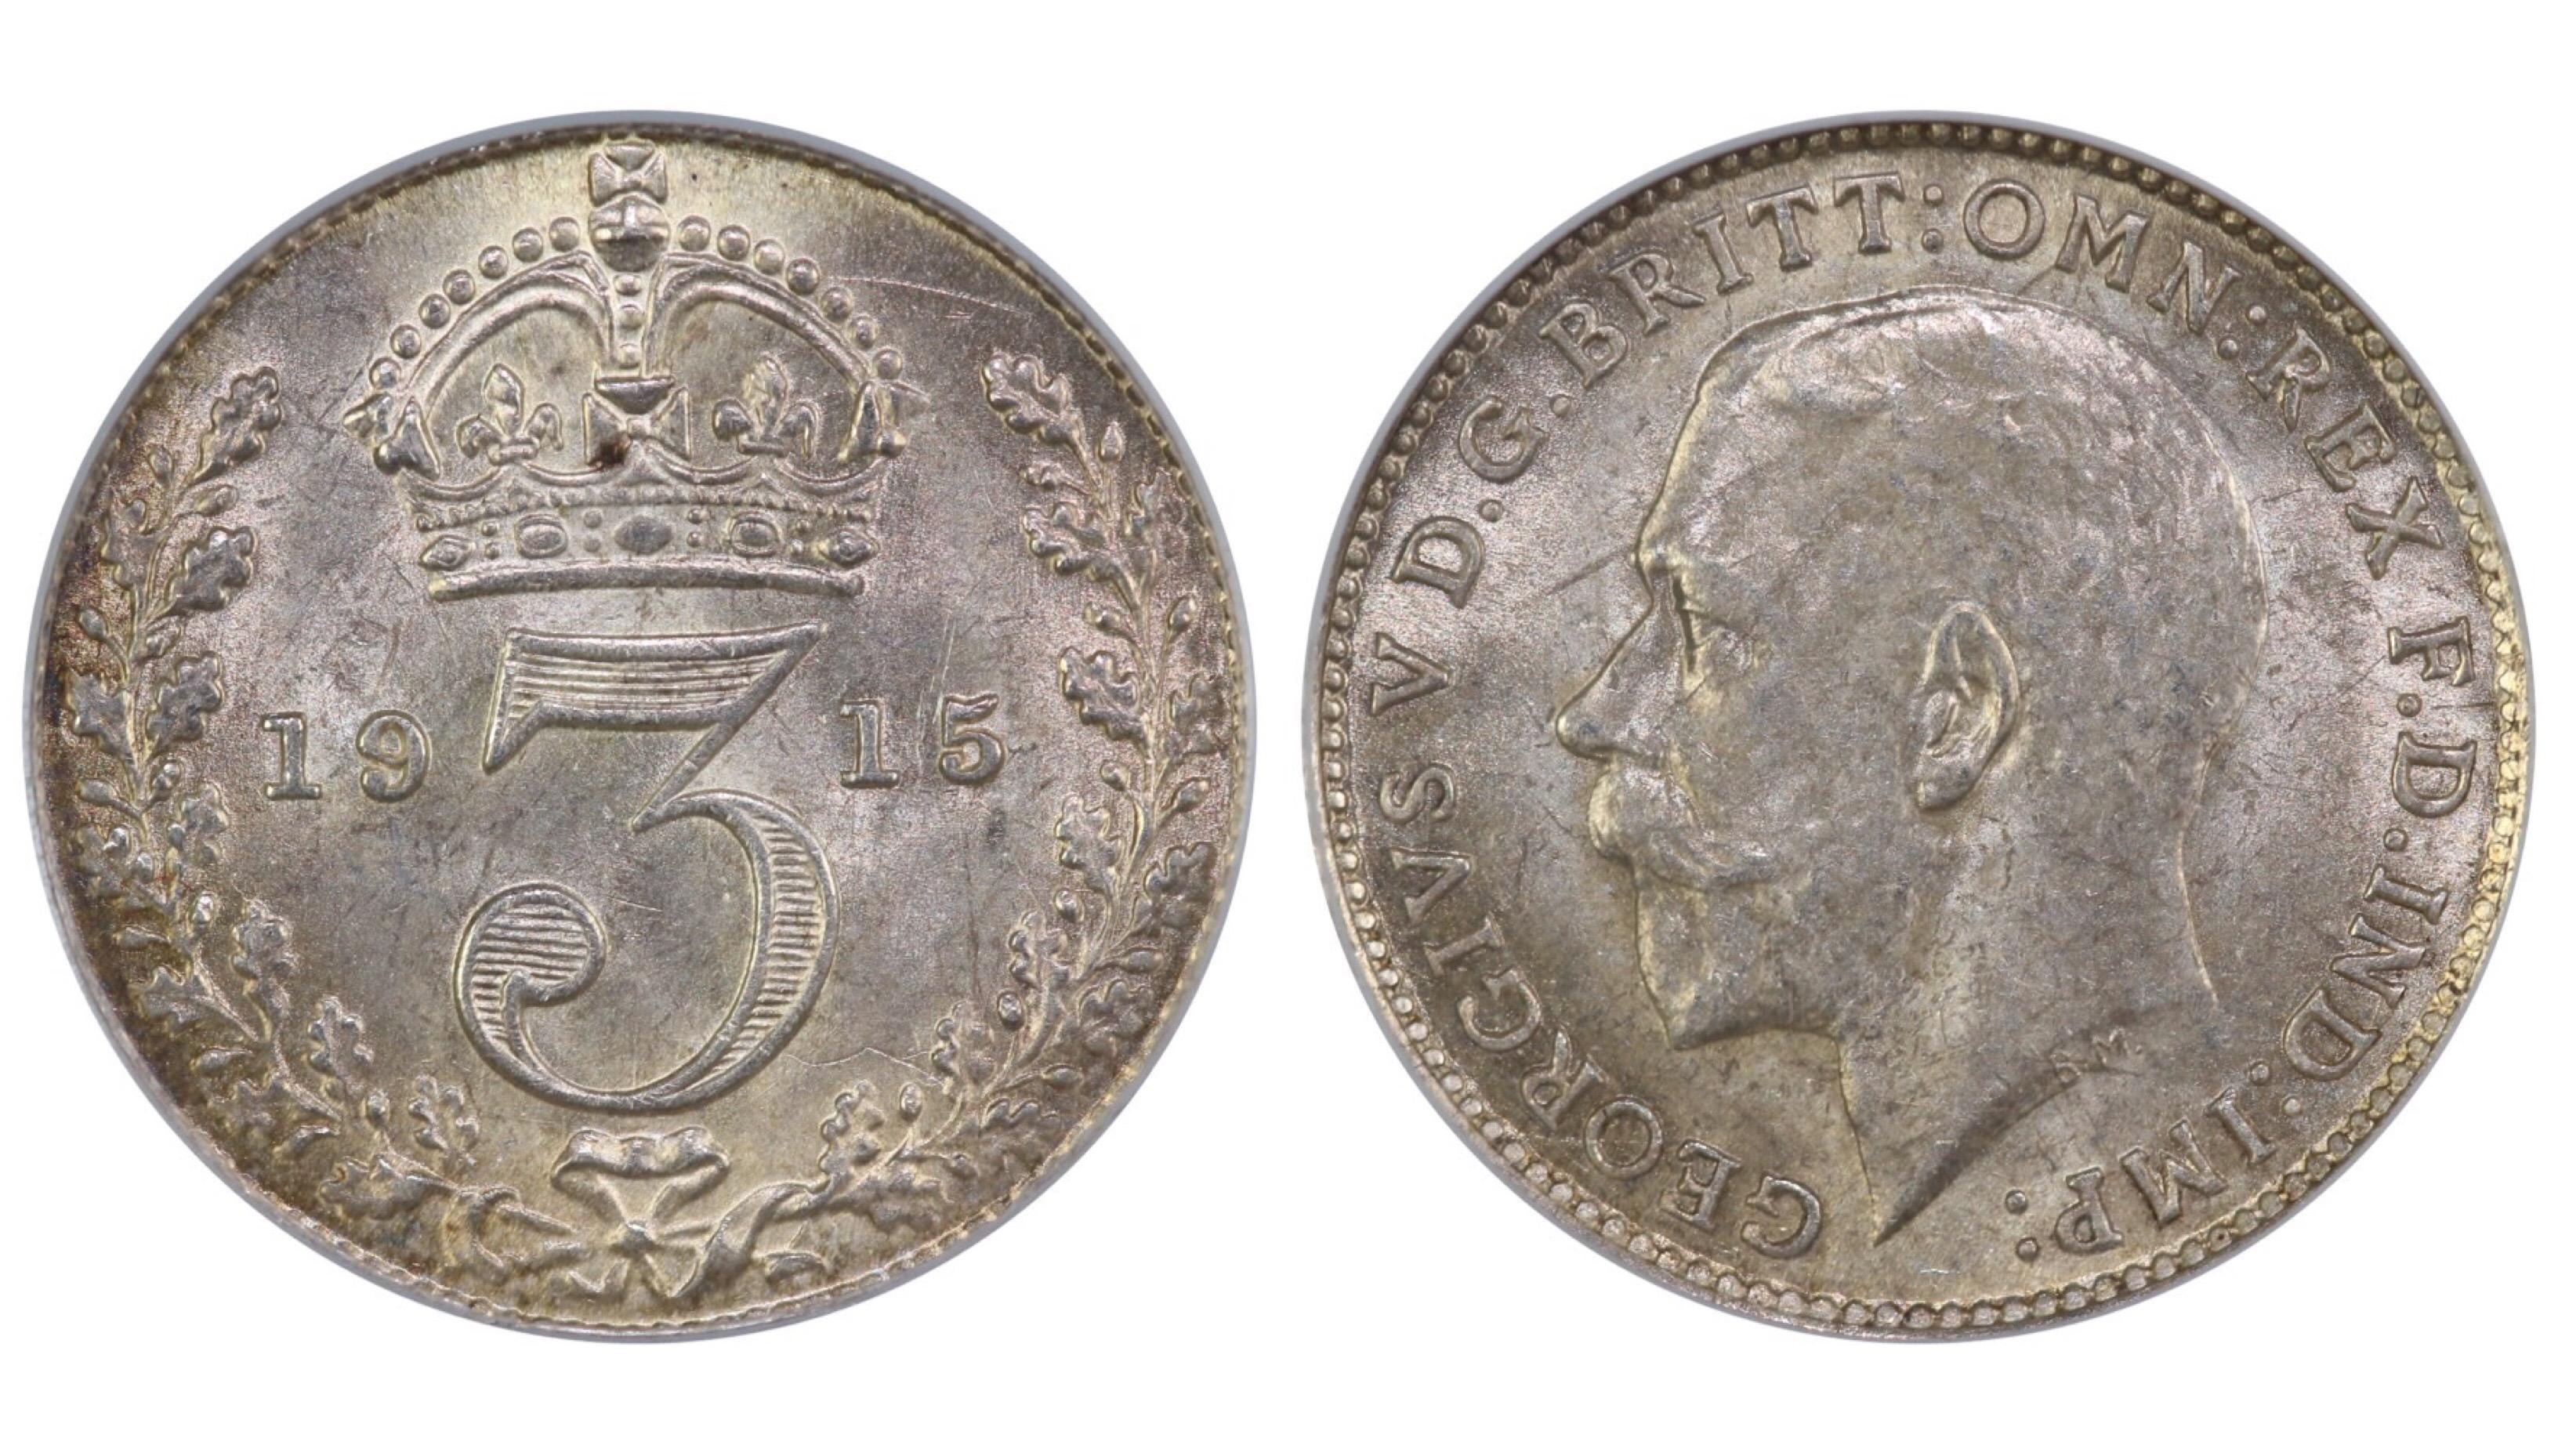 1915 Threepence, CGS 78, George V, ESC 2129, UIN 30010